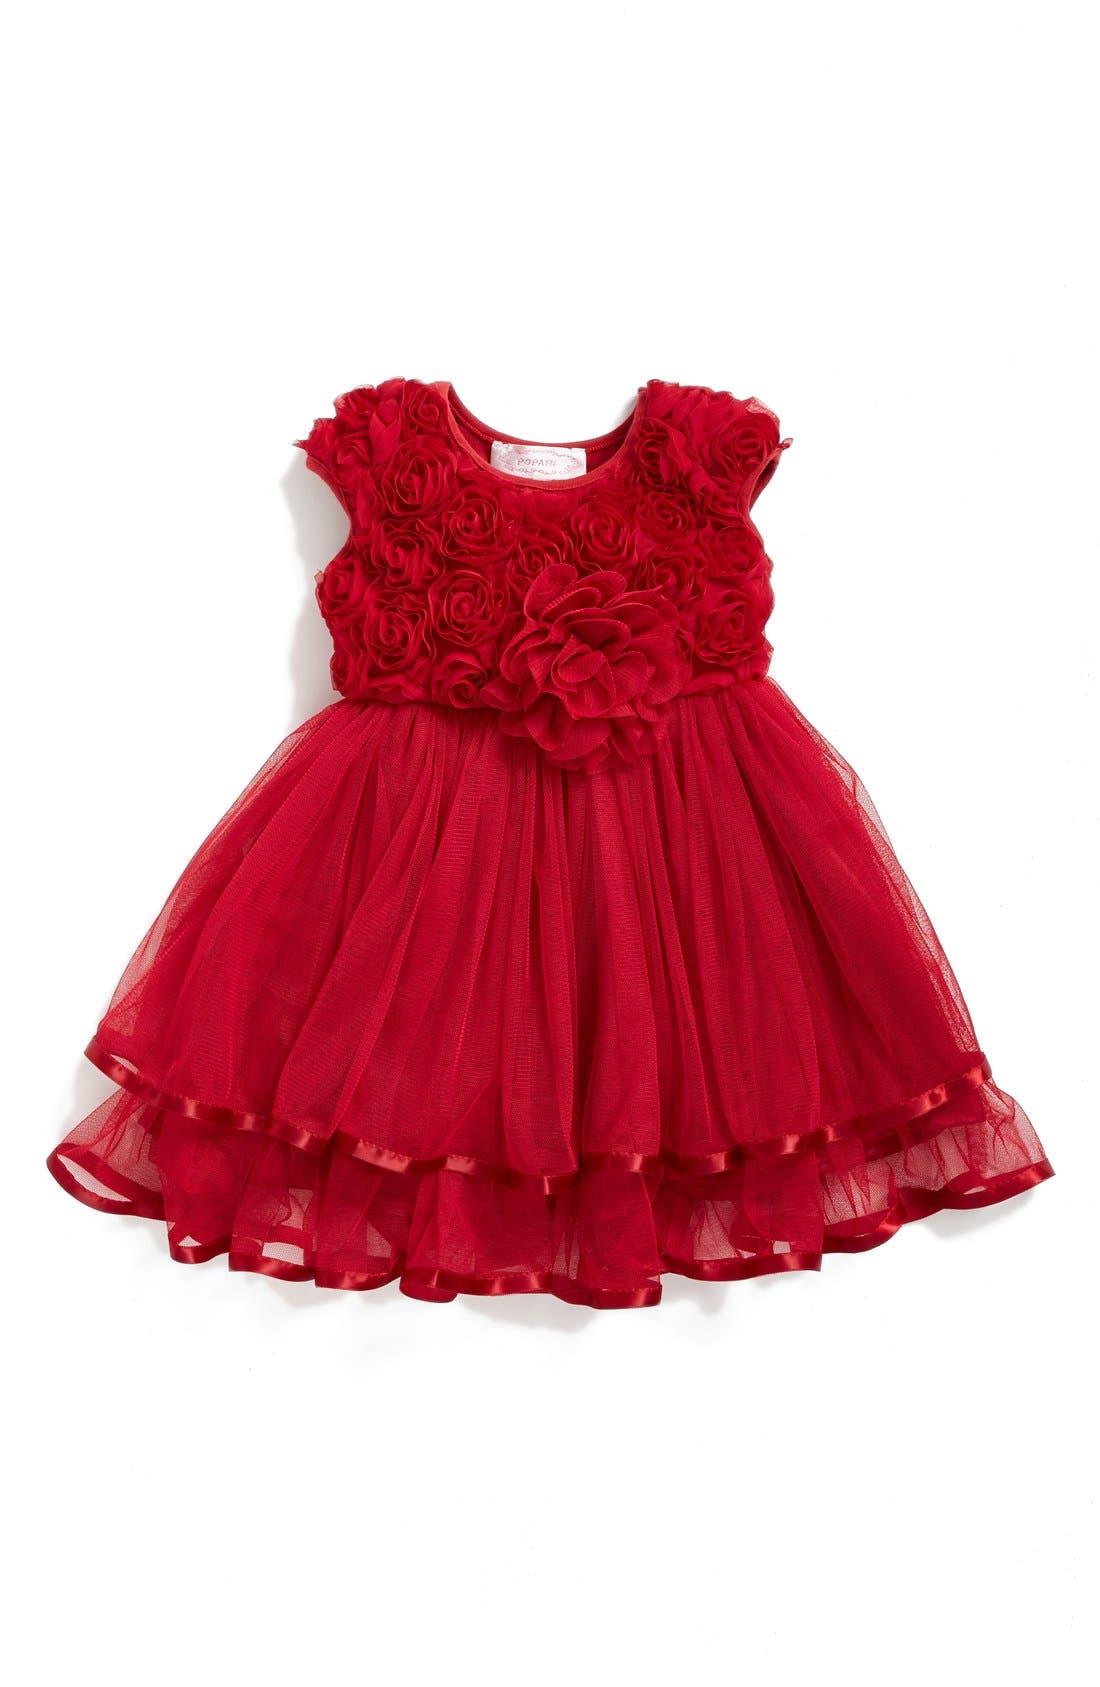 Rosette Tulle Dress,                             Main thumbnail 1, color,                             630